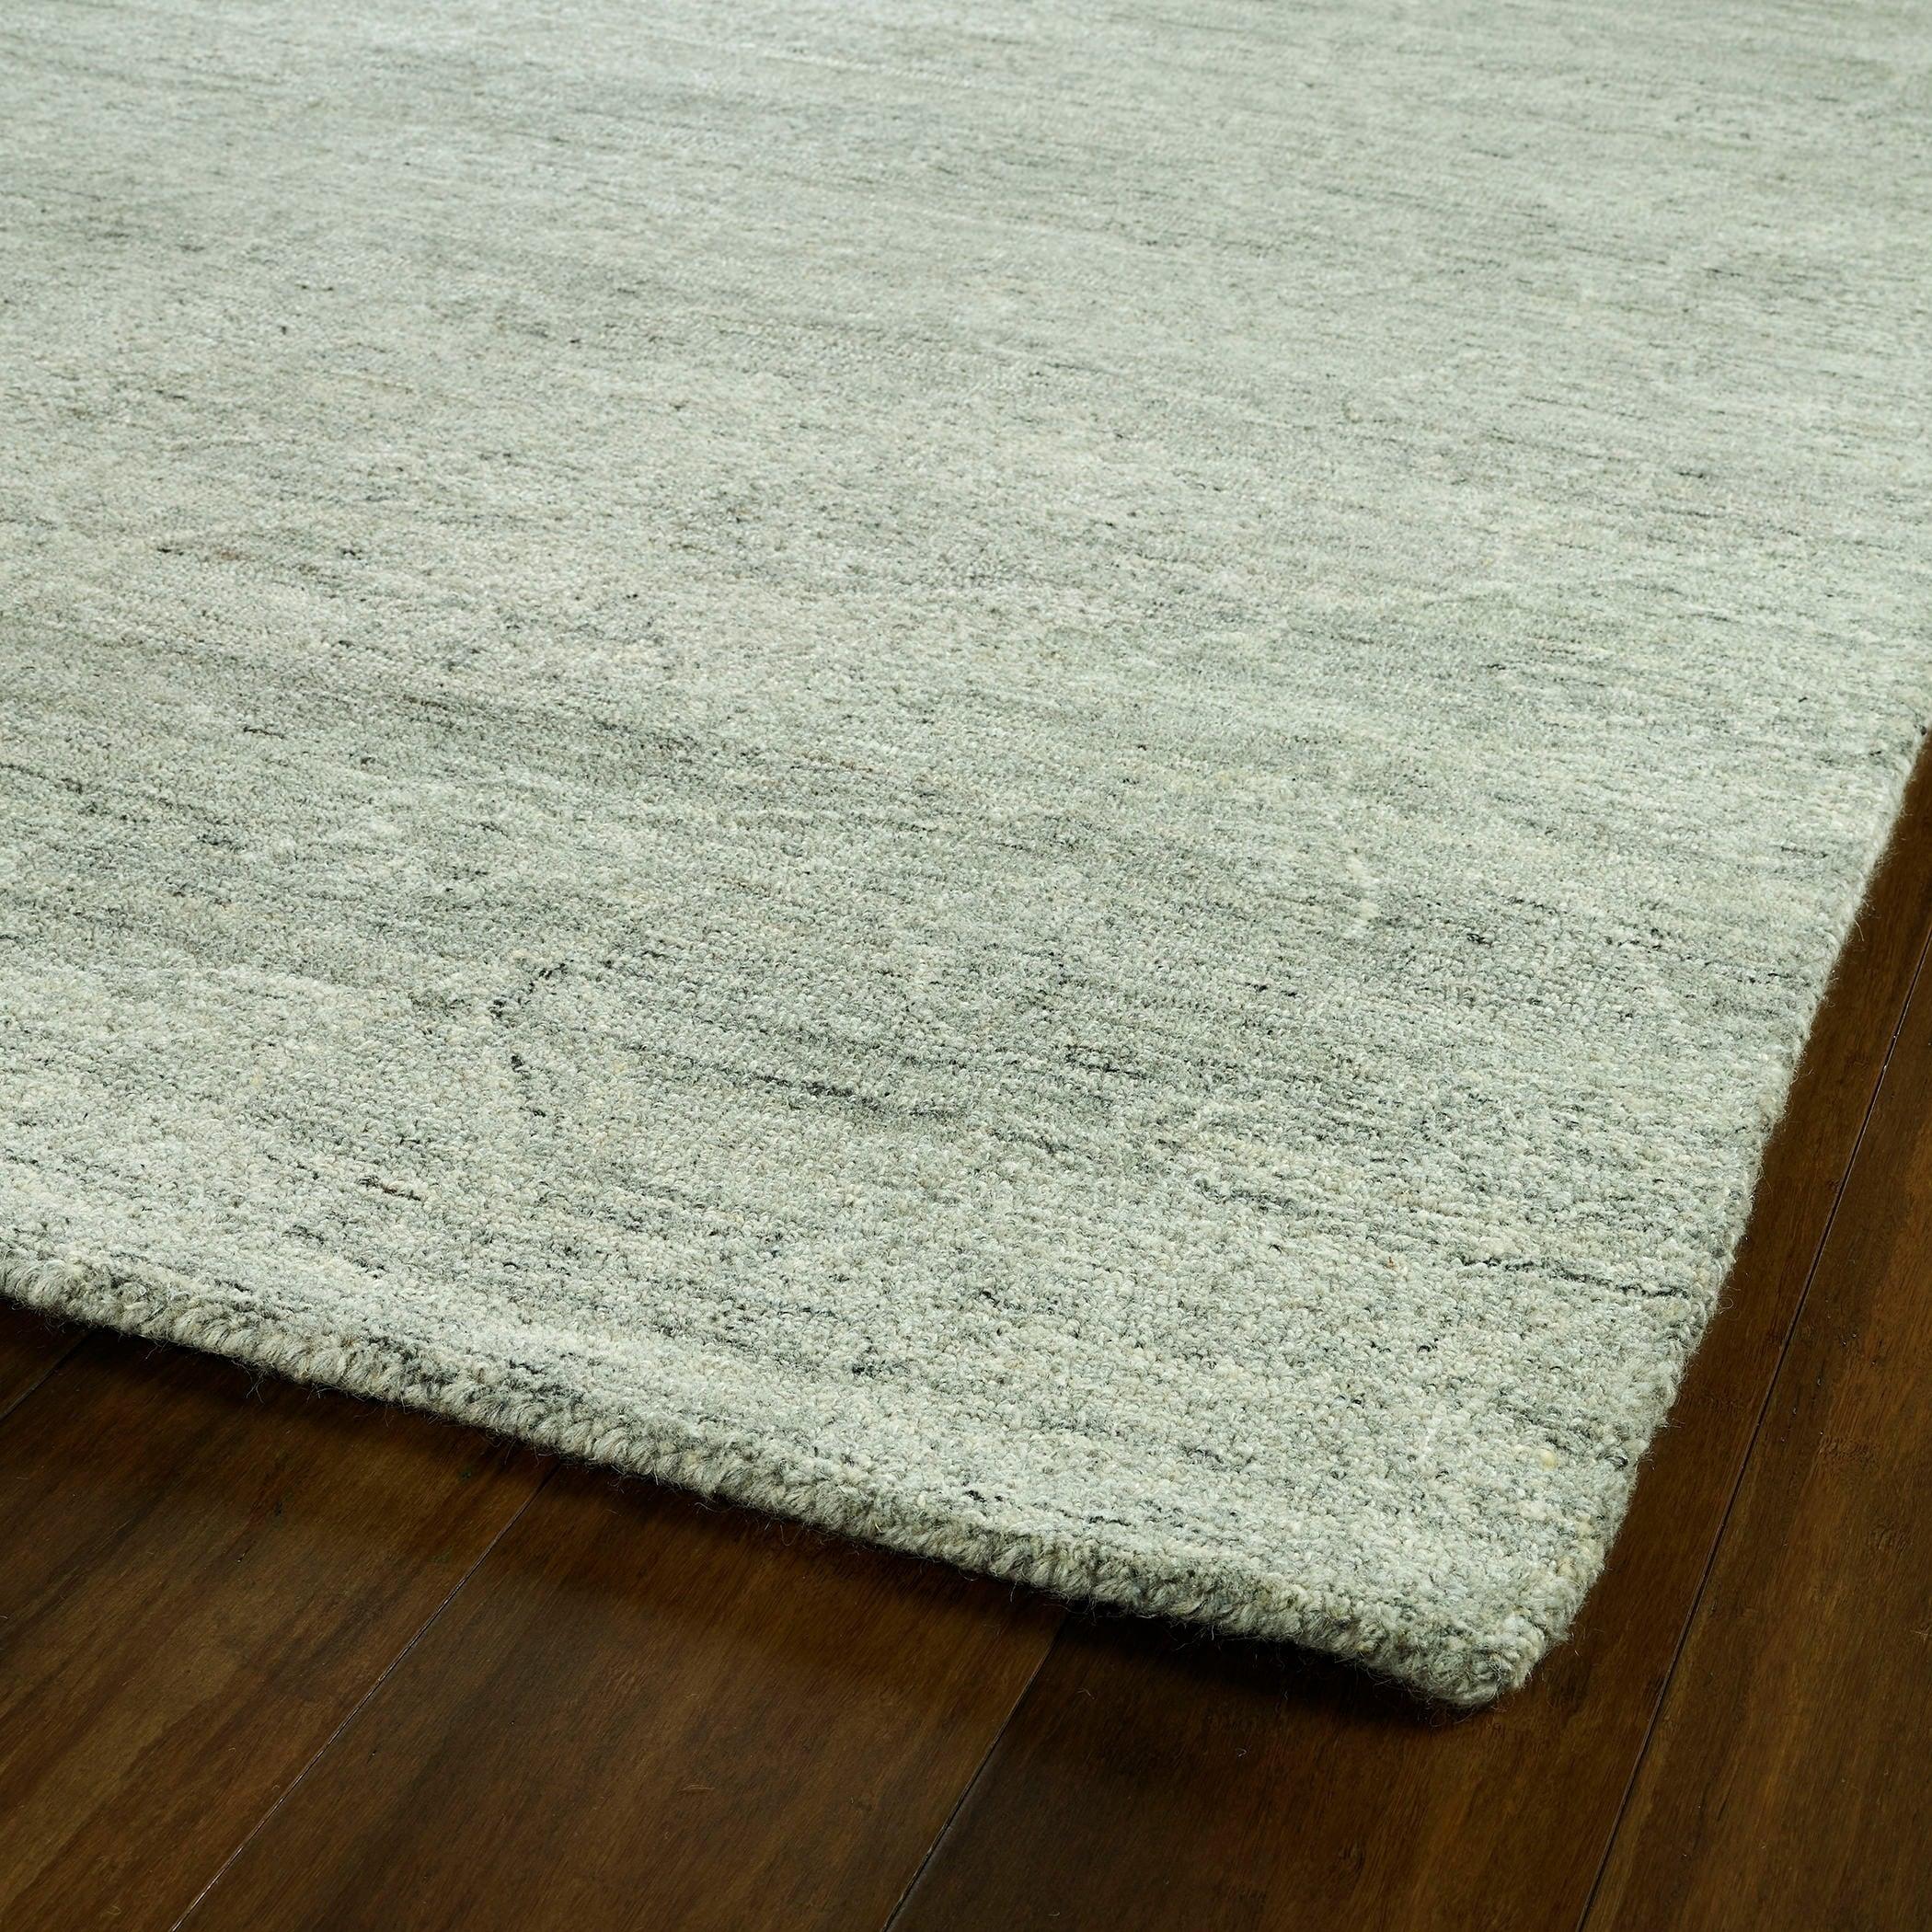 Casimir Rug Wool Handmade Area EDHIW29Y